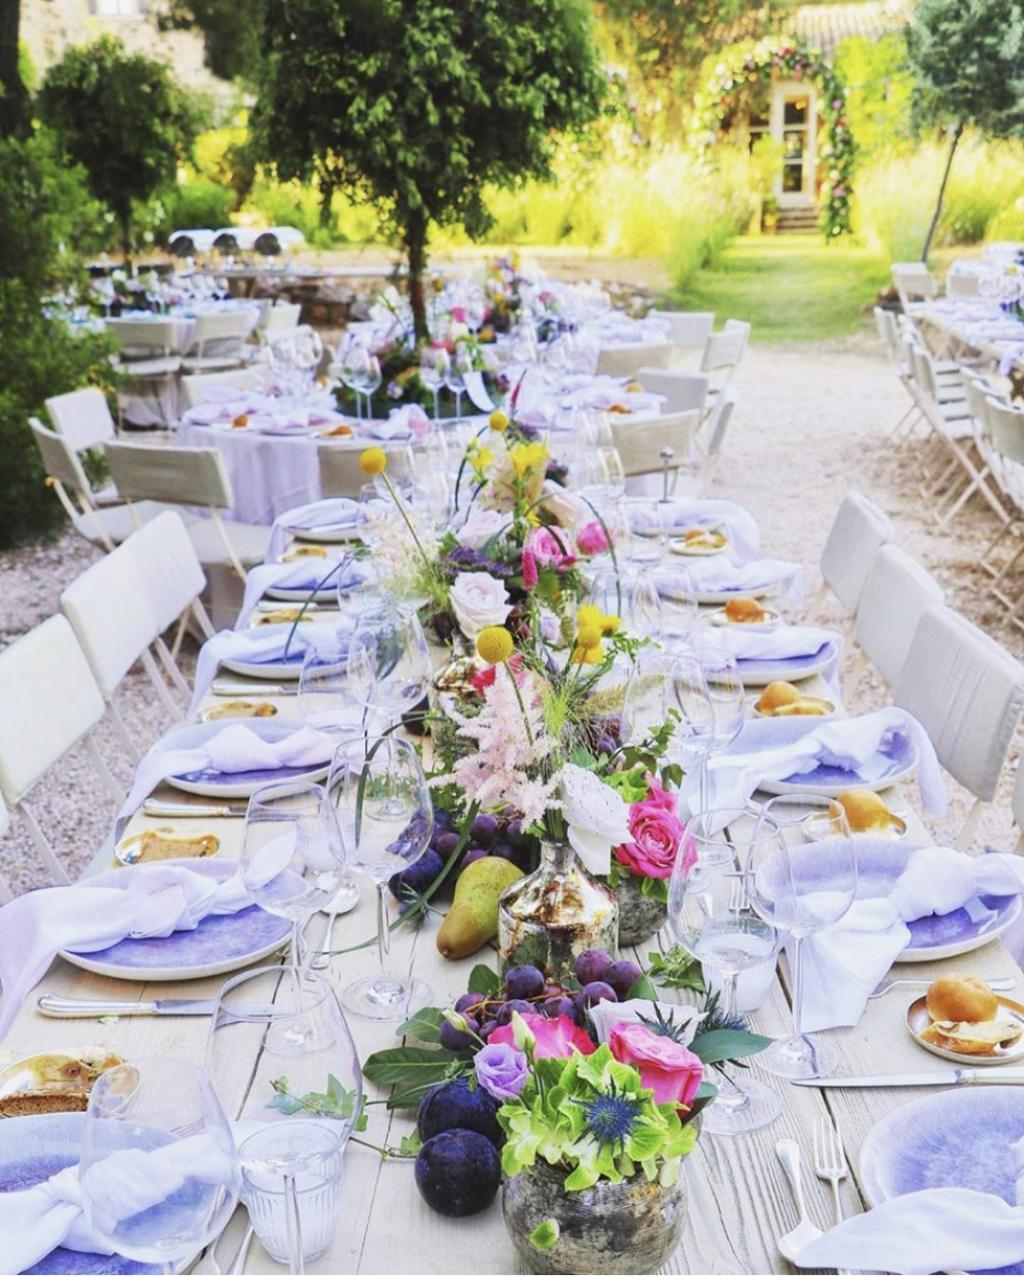 K&K Athenian Riviera pre-wedding & Sinterina wedding - Image 12